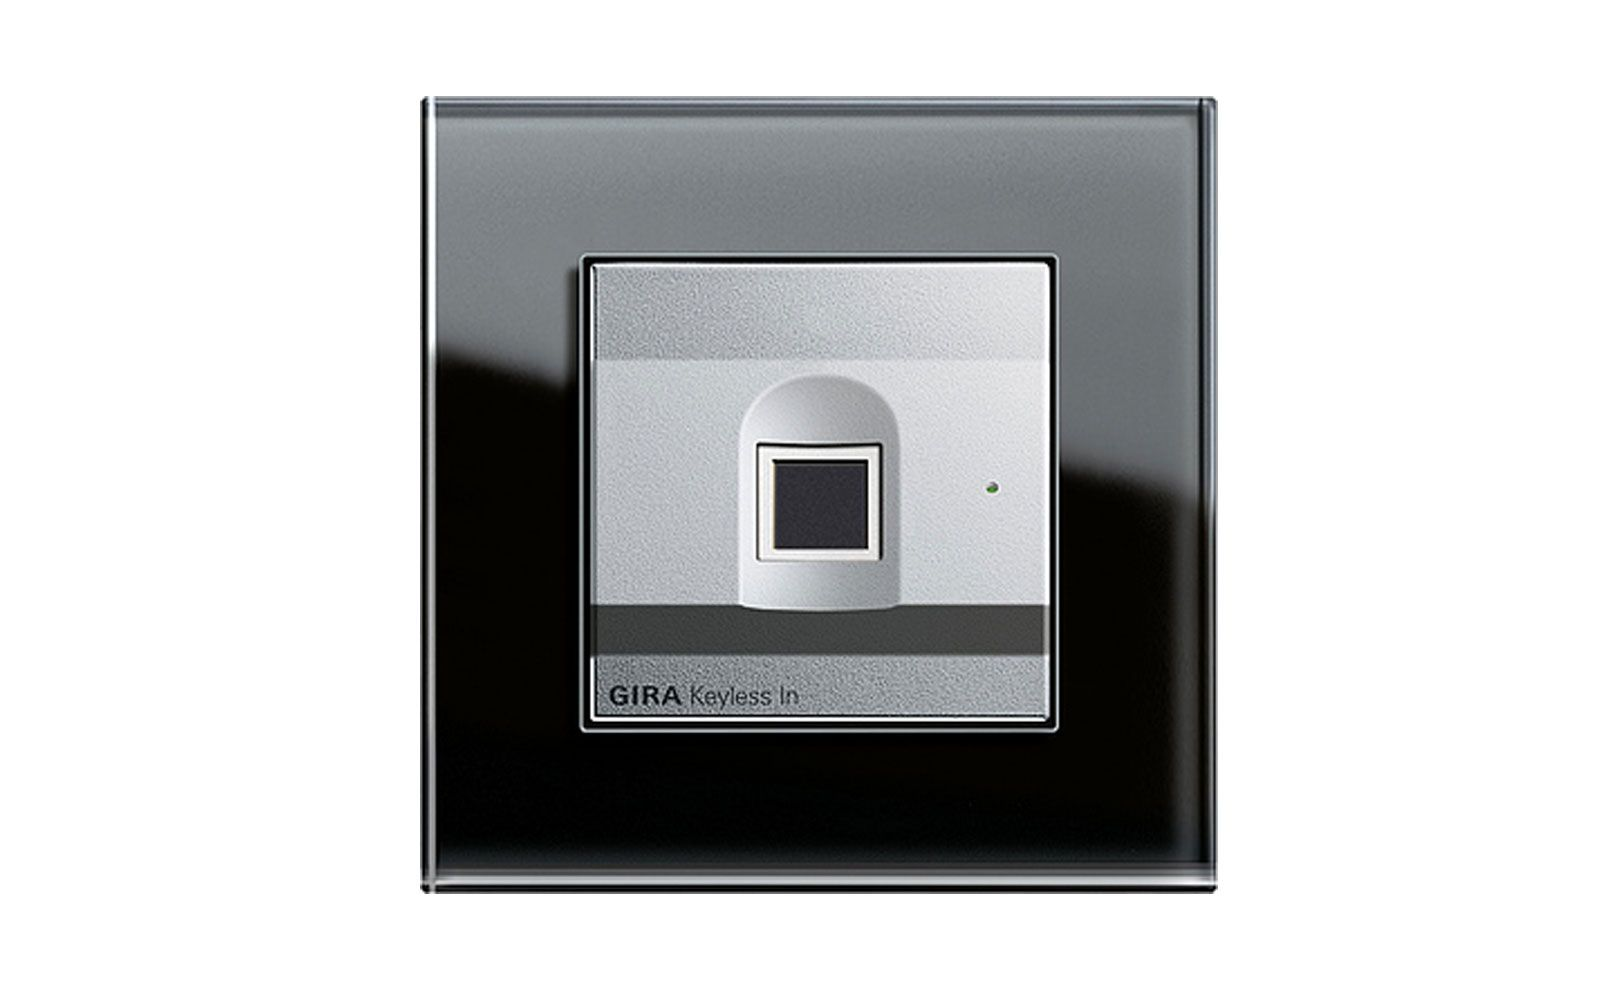 gira-keyless-in_19395_1558347853.jpg